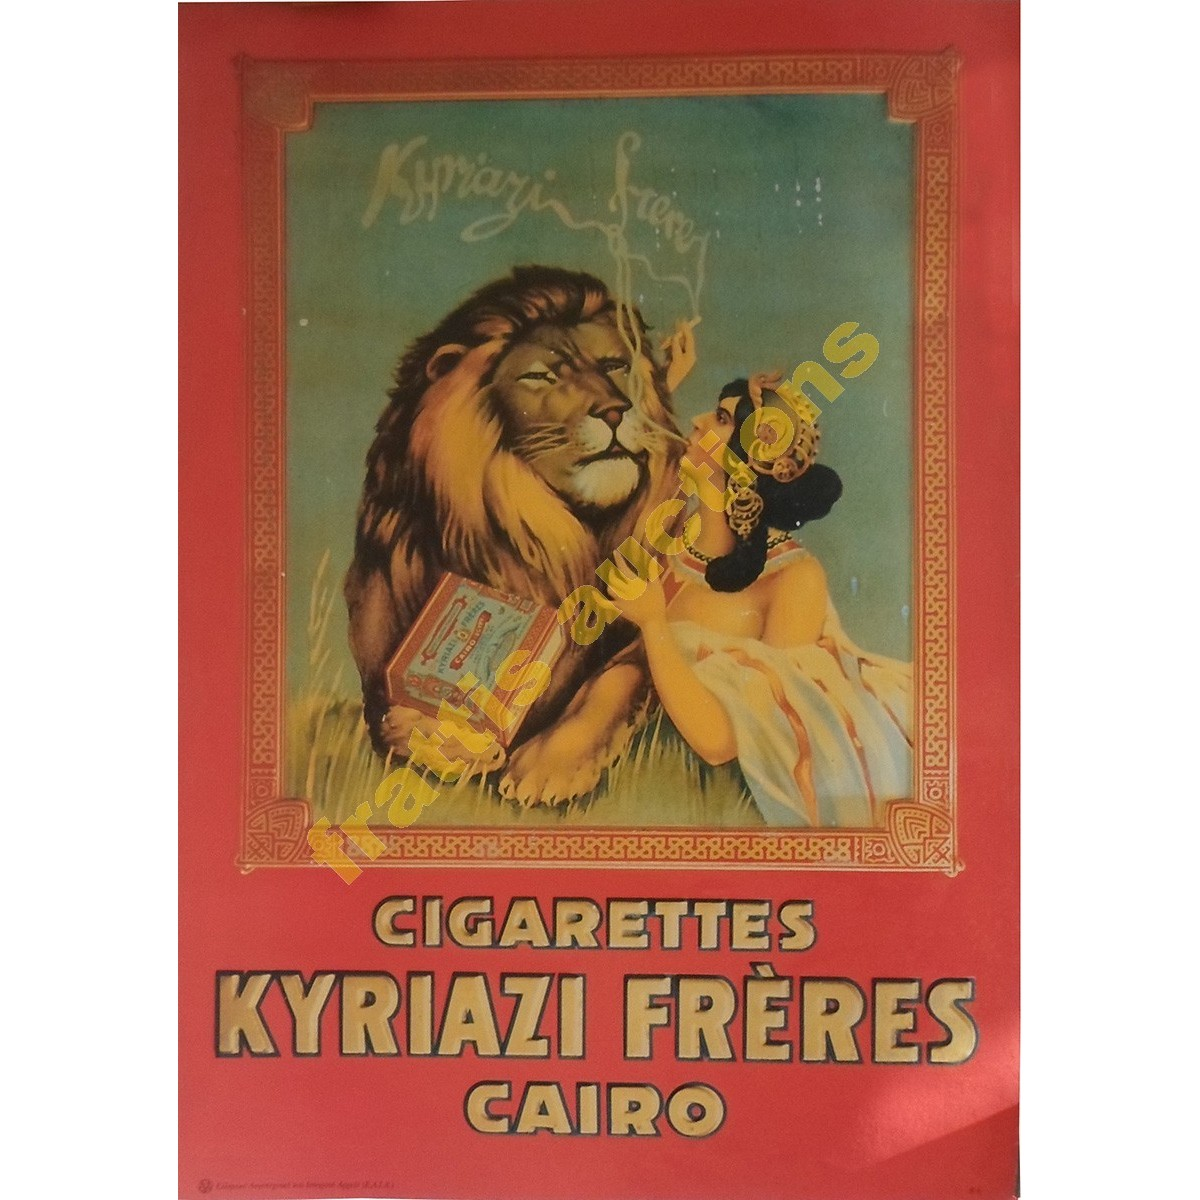 Cigarettes Kyriazi Freres Cairo, διαφημιστικό poster.